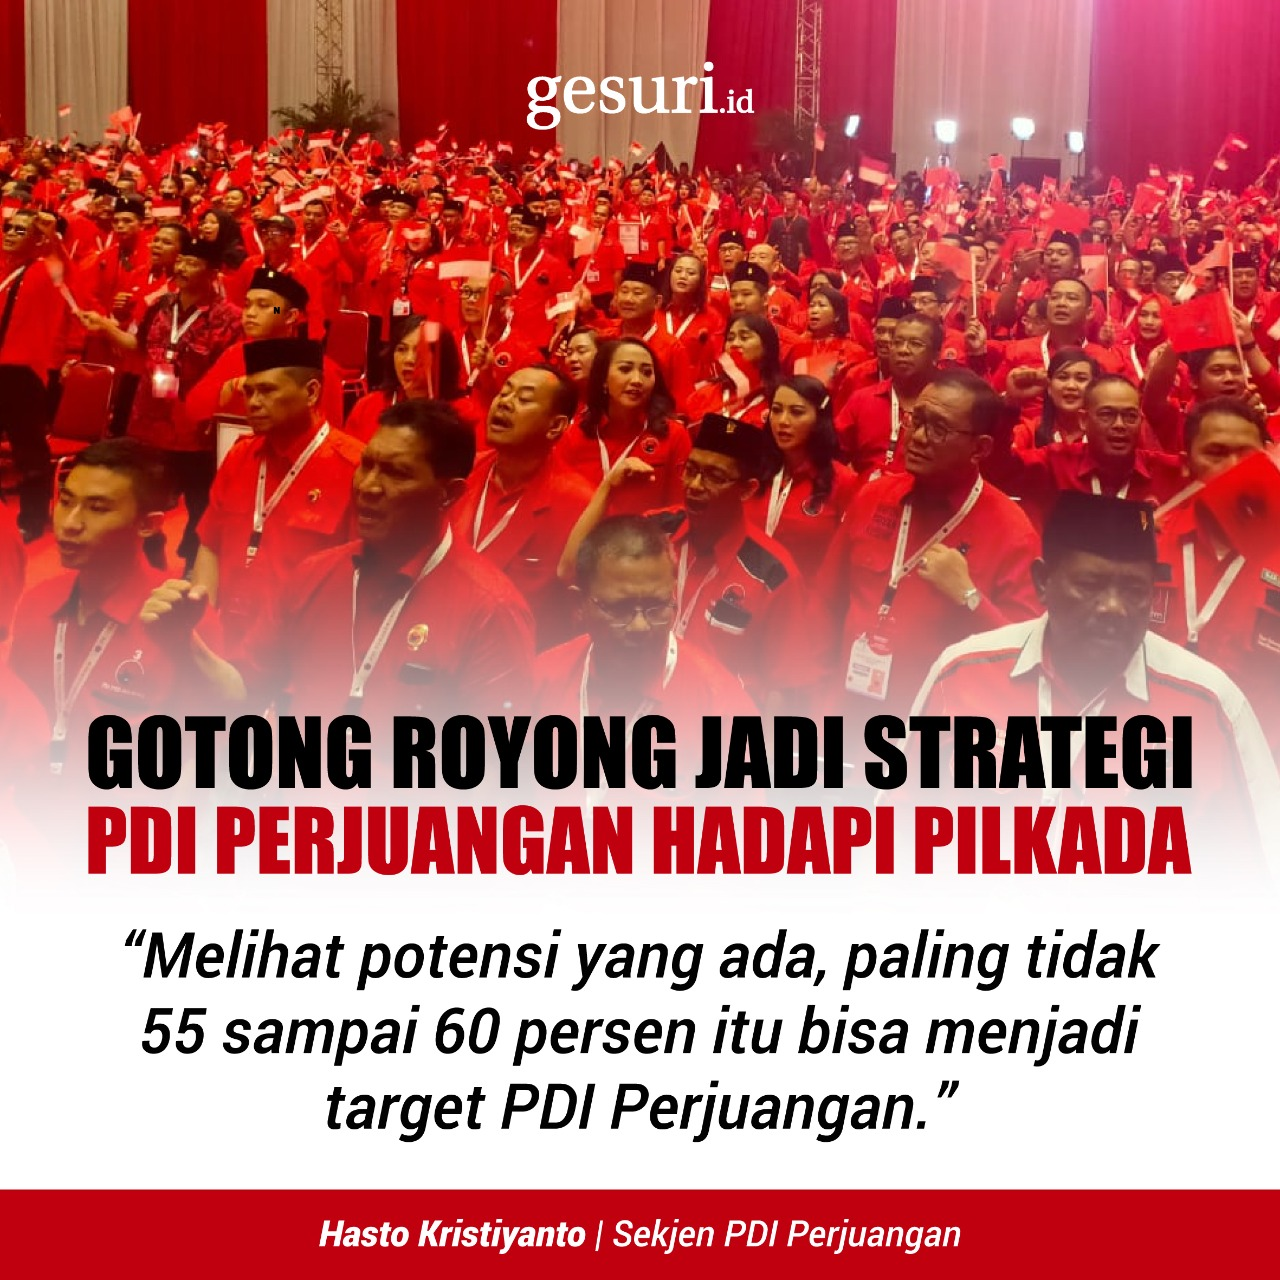 Gotong Royong Jadi Strategi PDI Perjuangan Hadapi Pilkada